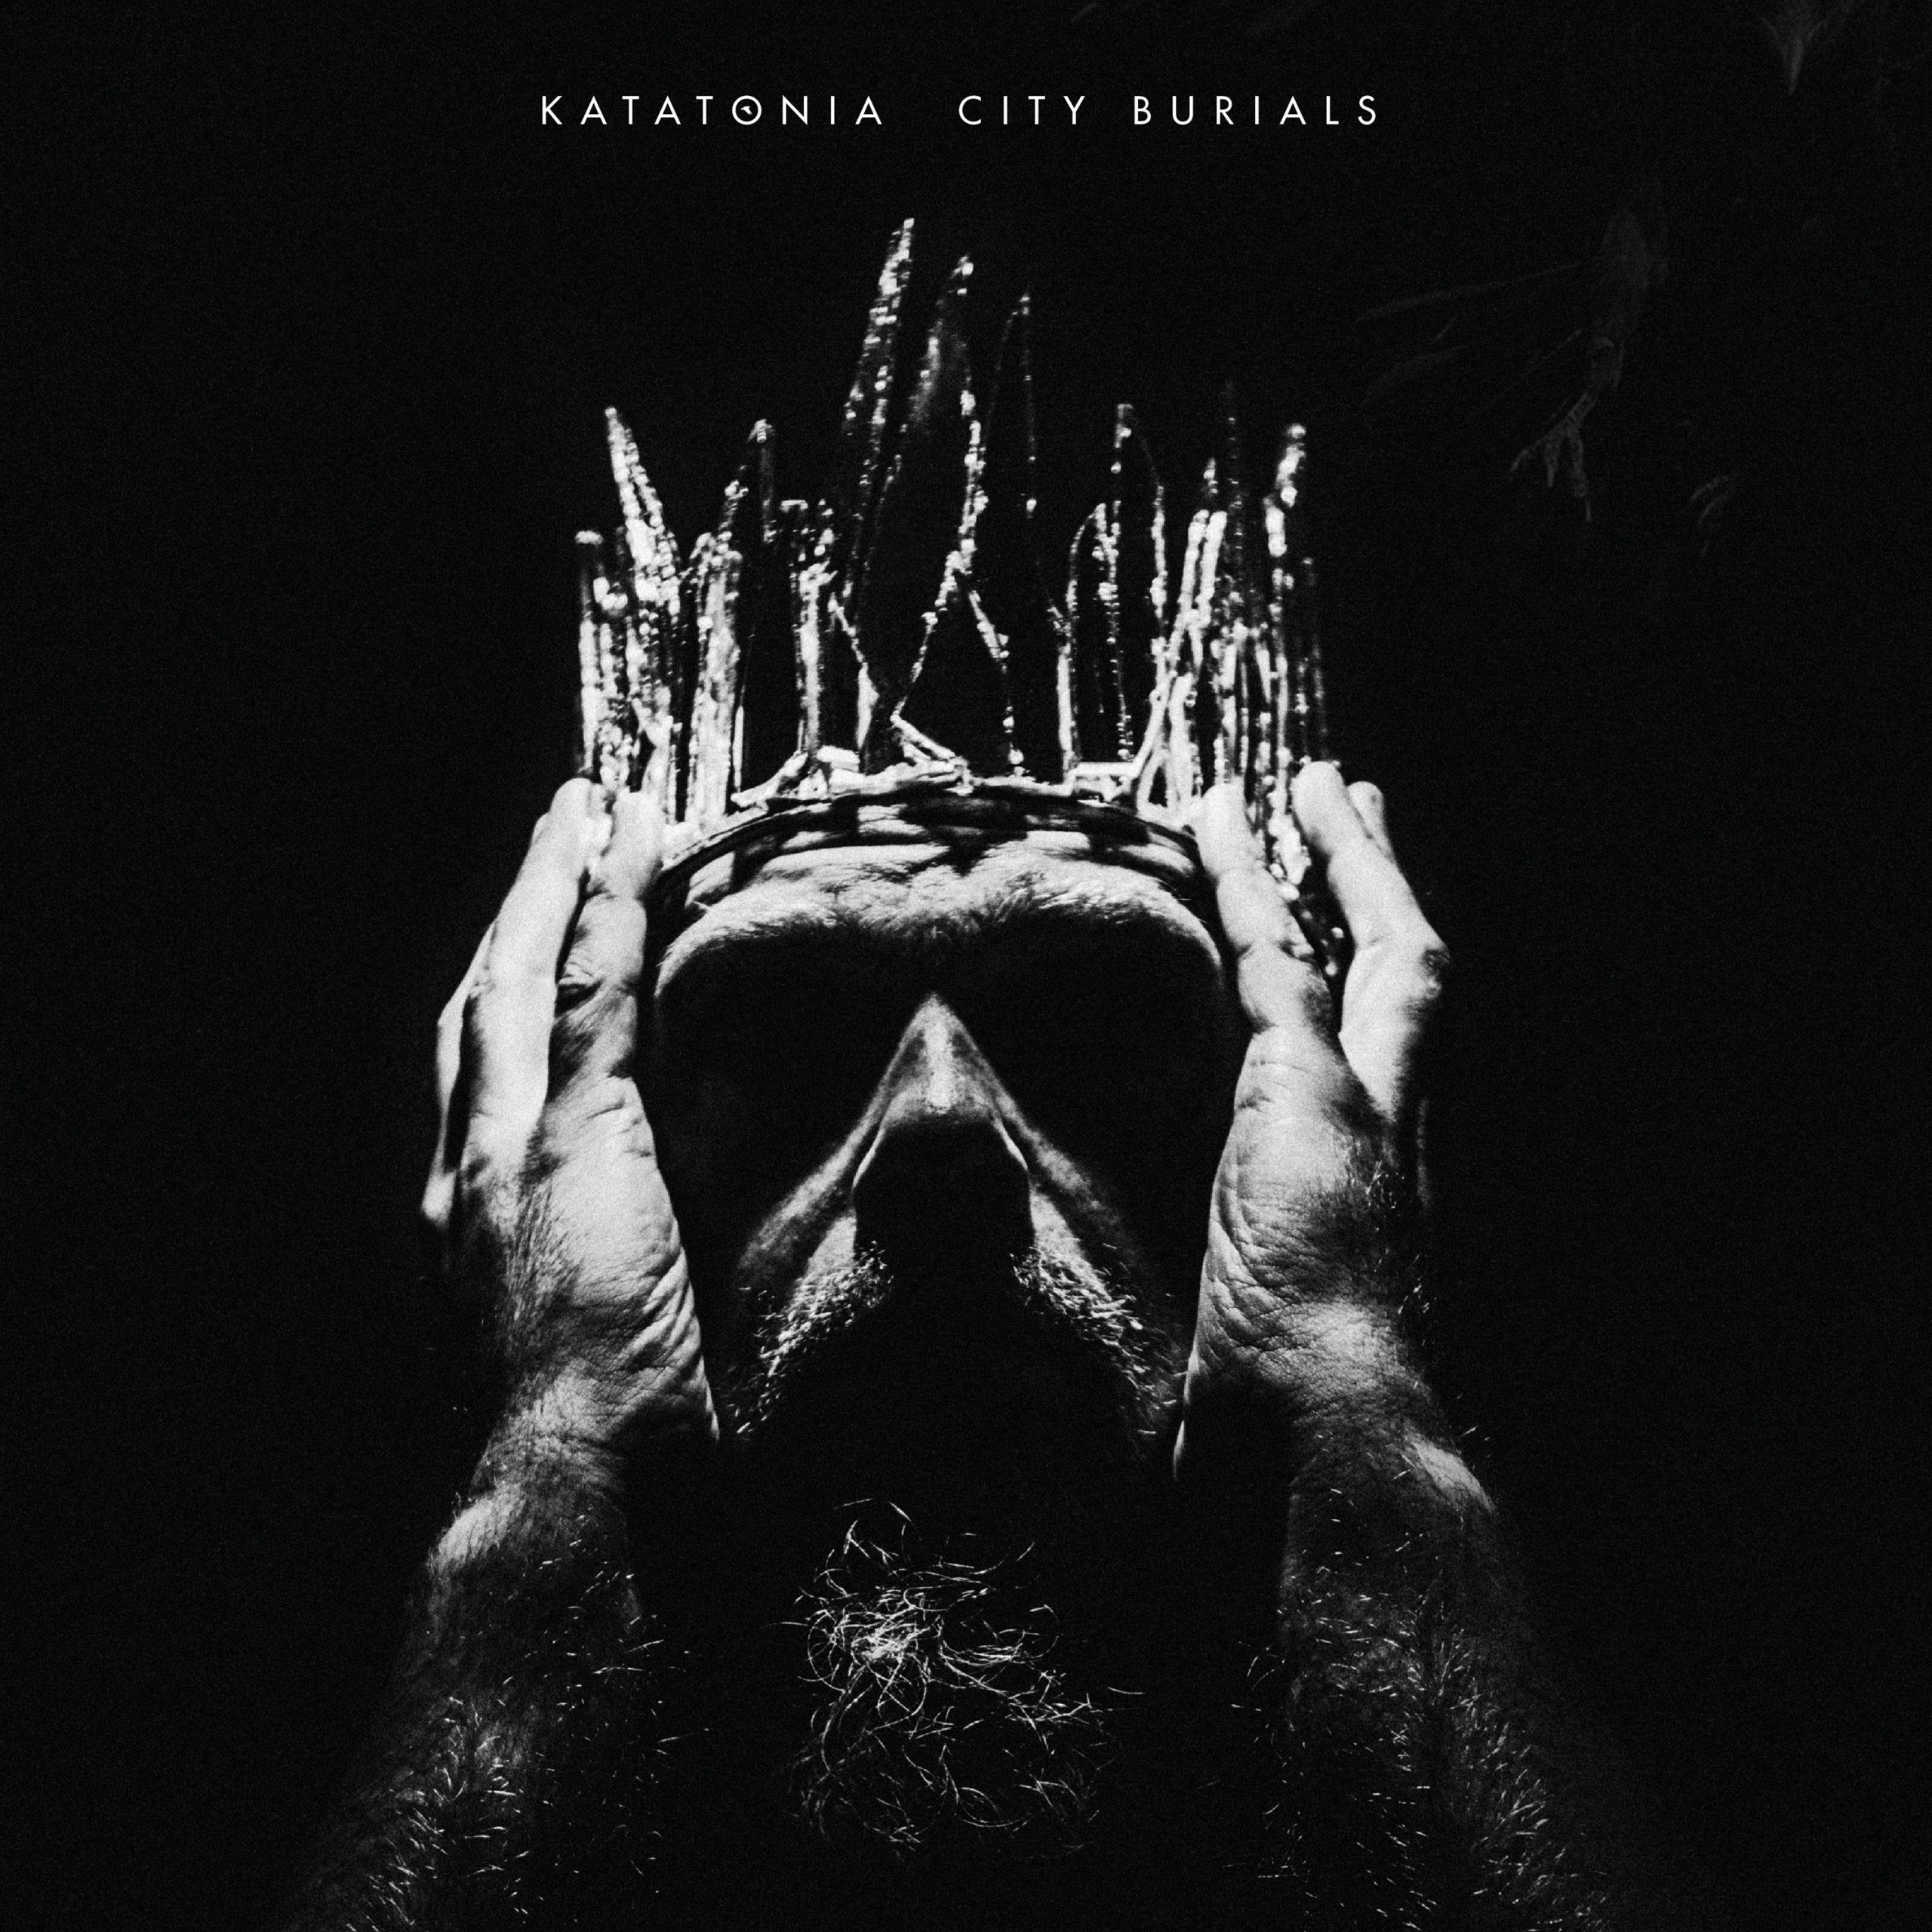 Últimas Compras - Página 14 Katatonia-City-Burials-01-scaled